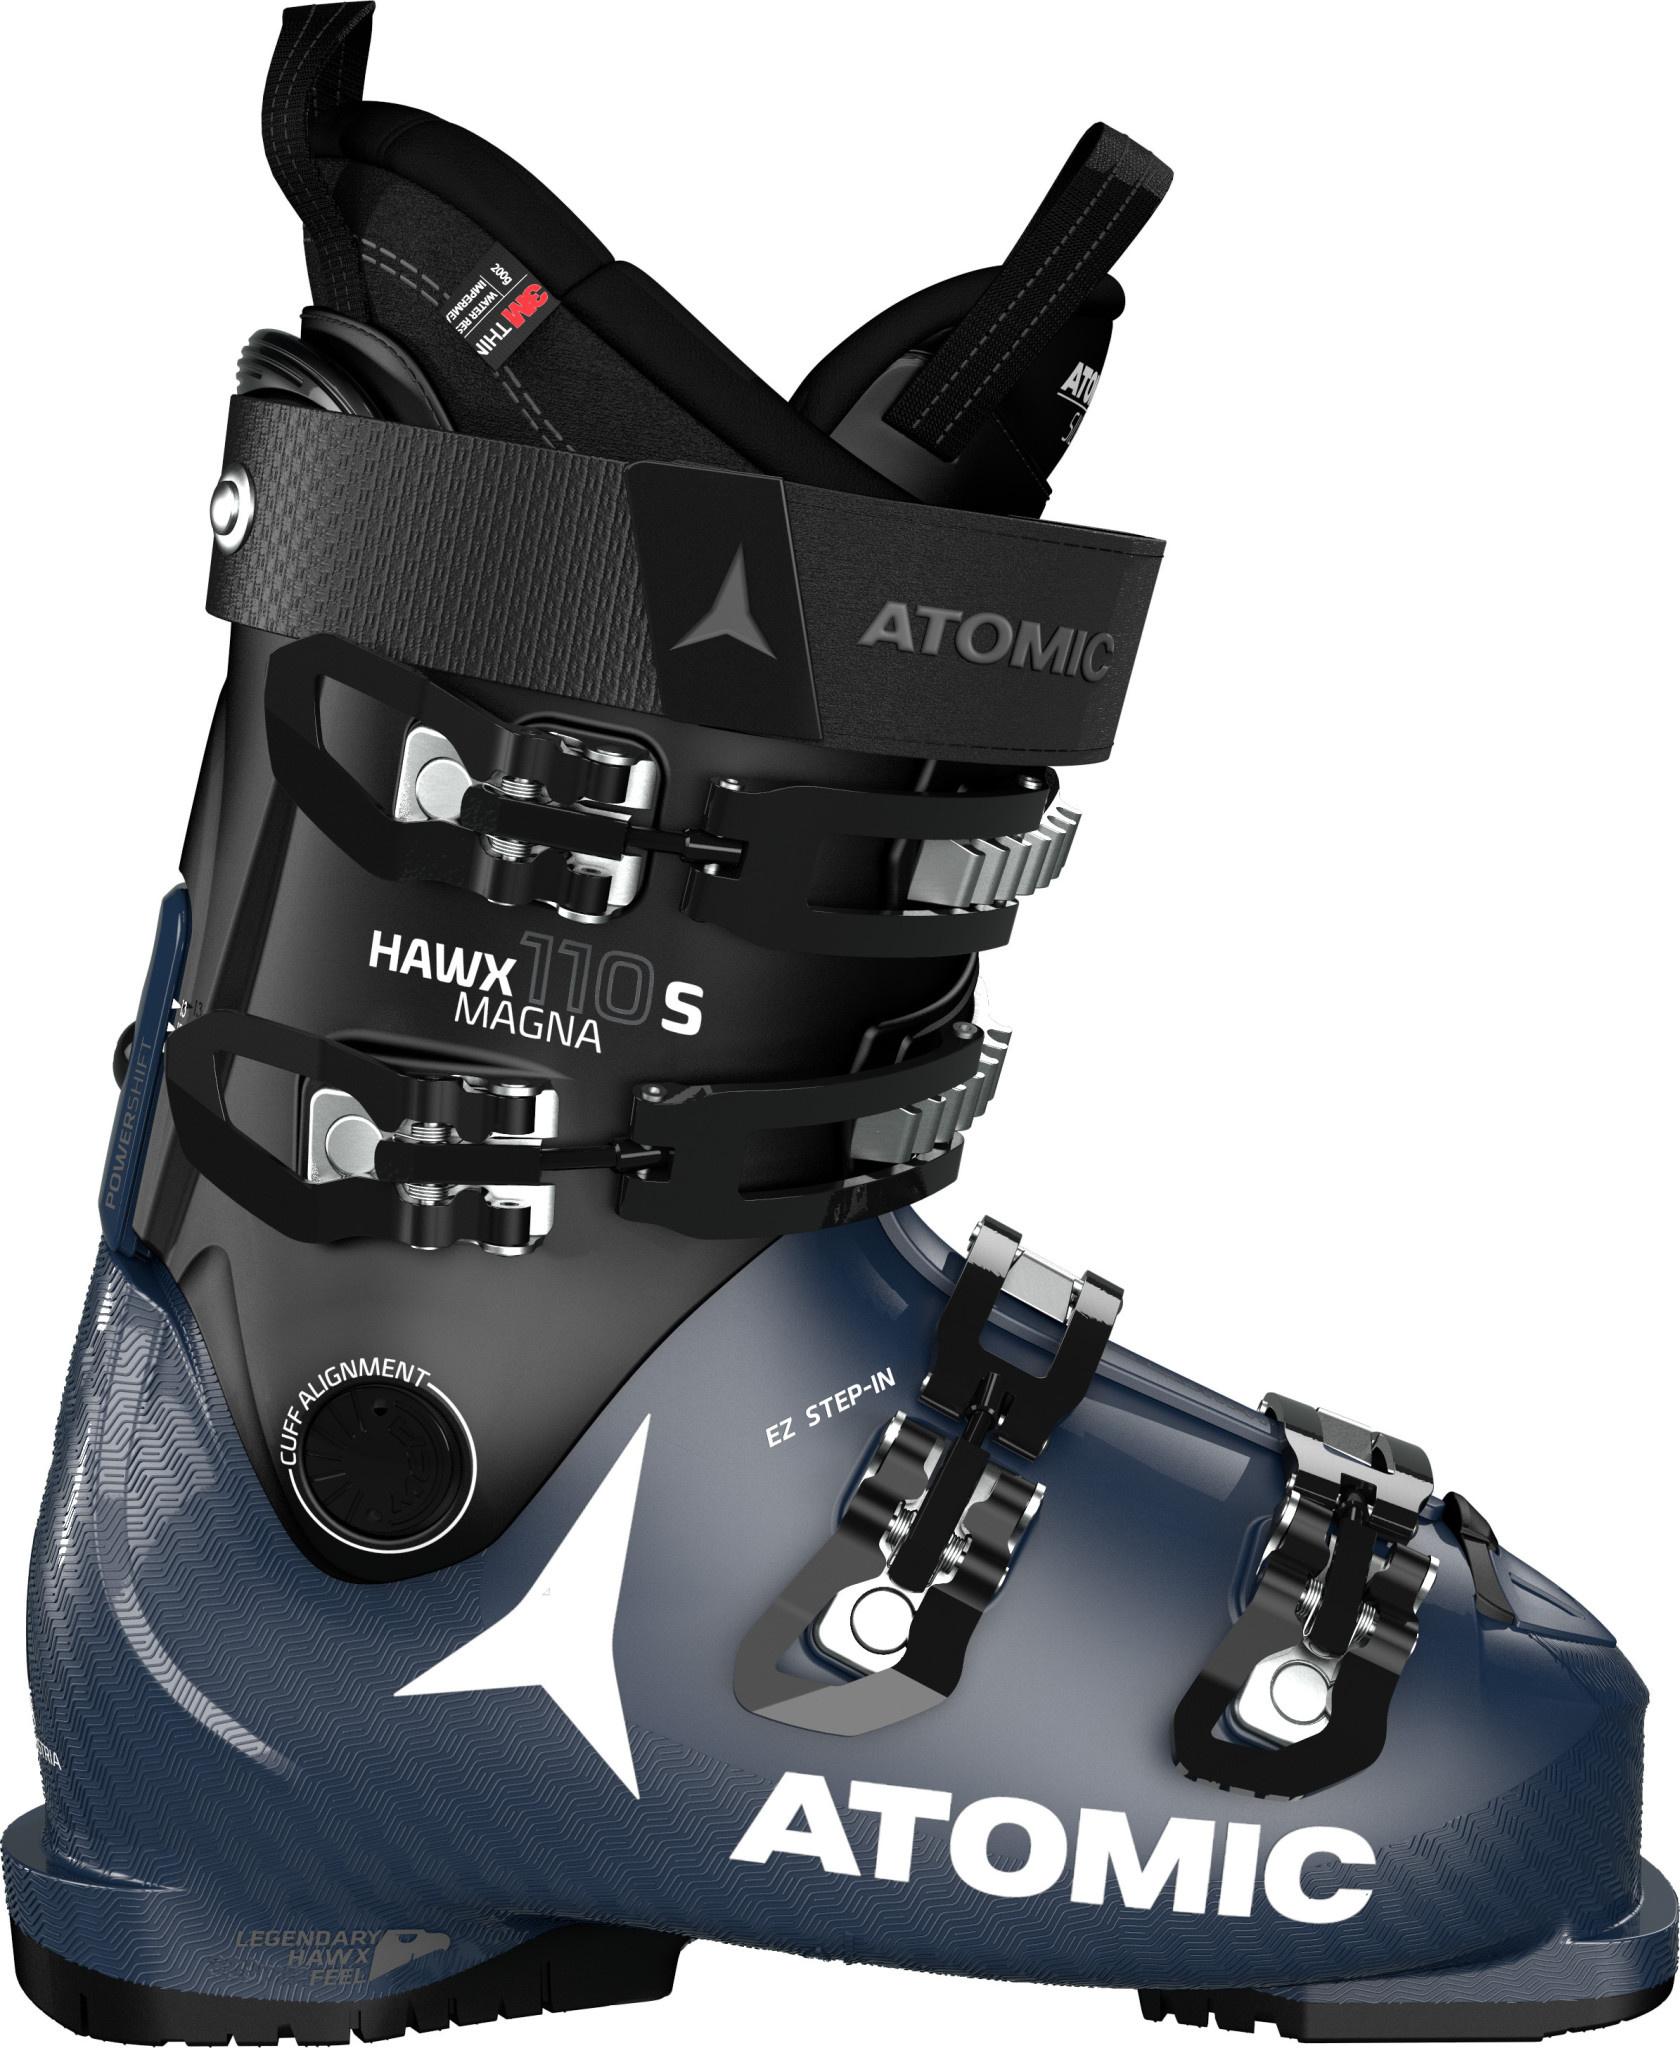 Atomic Hawx Magna 110 S-1